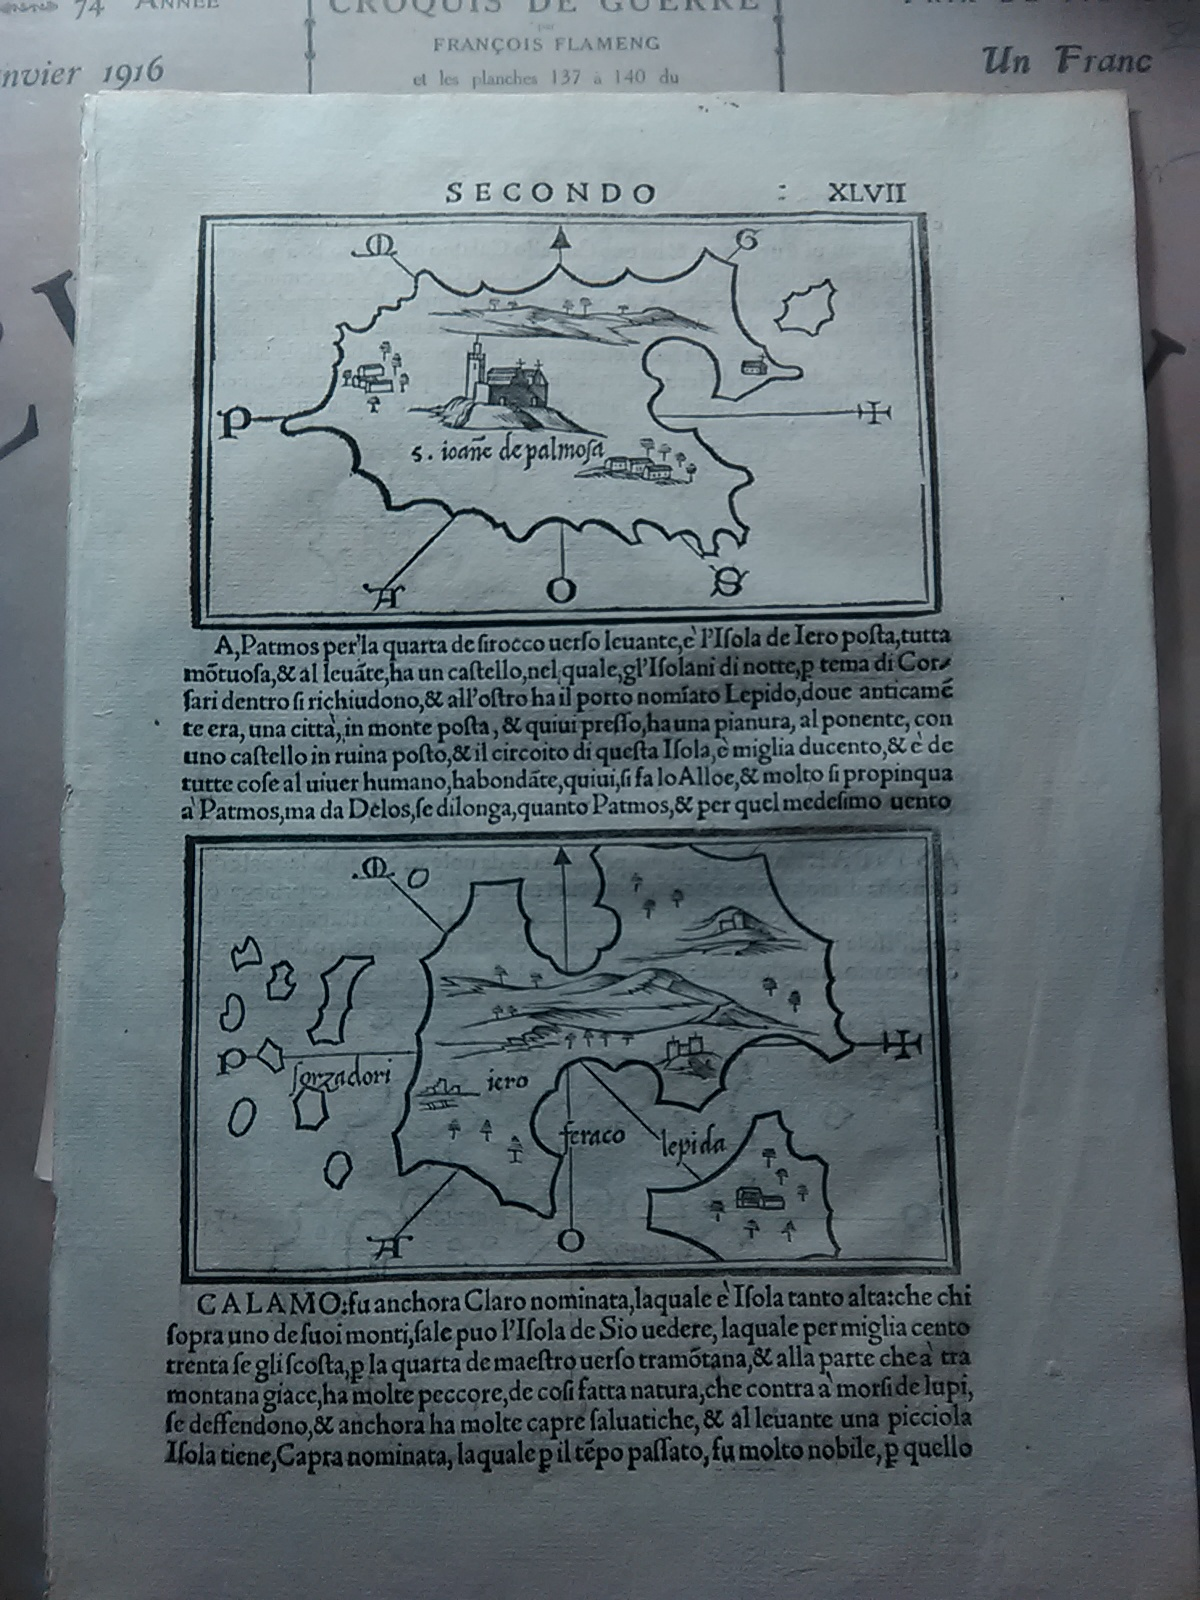 Bordone Patmos.jpg